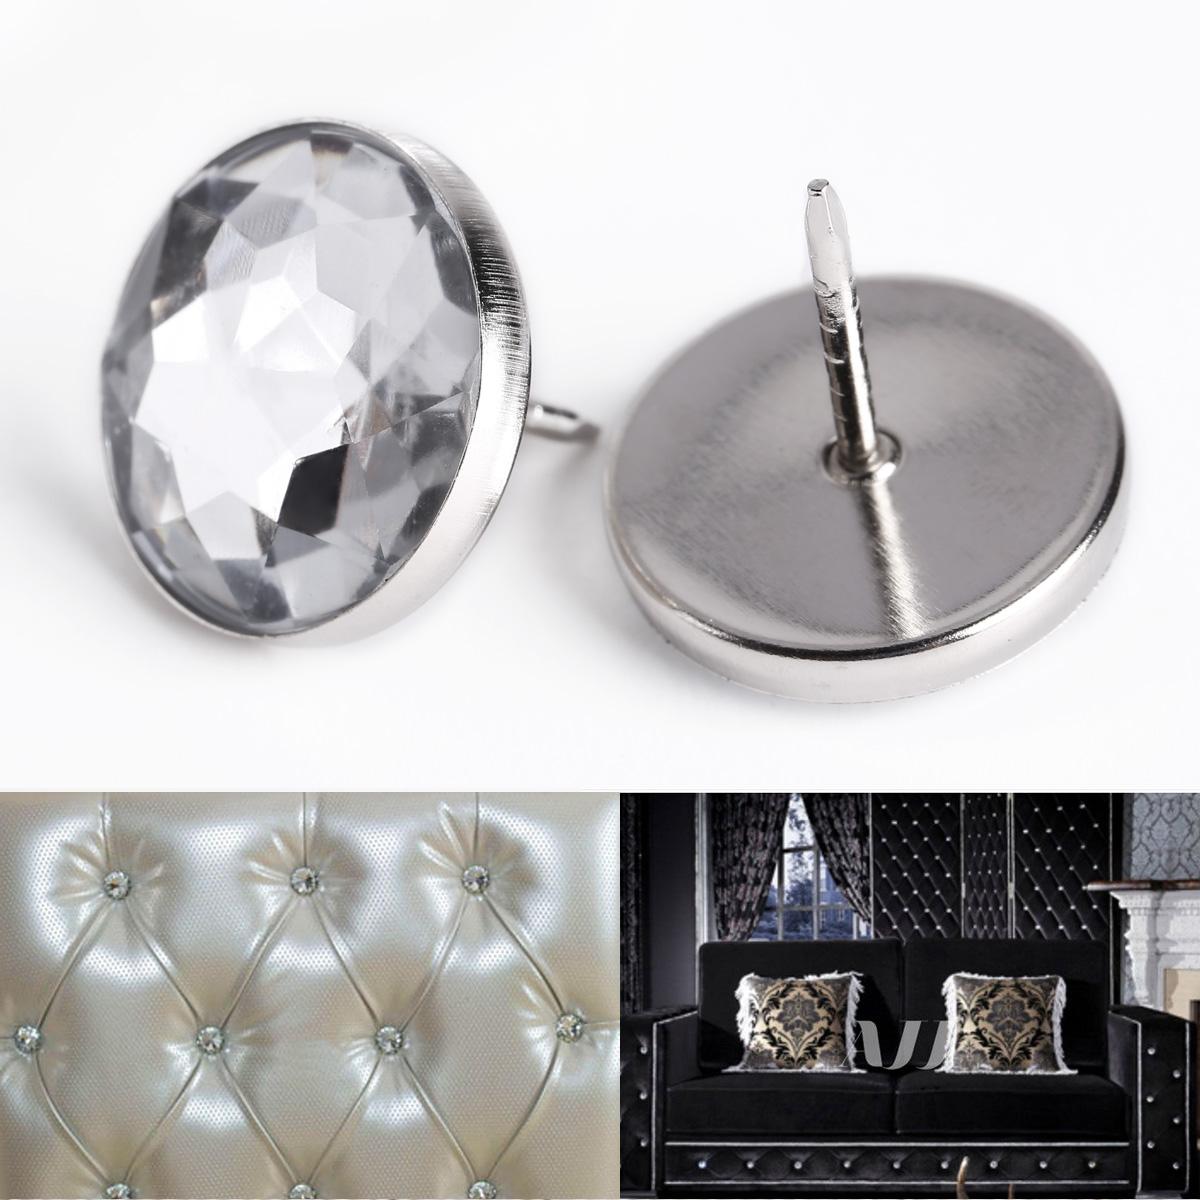 25pcs 20mm Diamante Crystal Buttons Upholstery Sofa Headboard Button Wall Decor